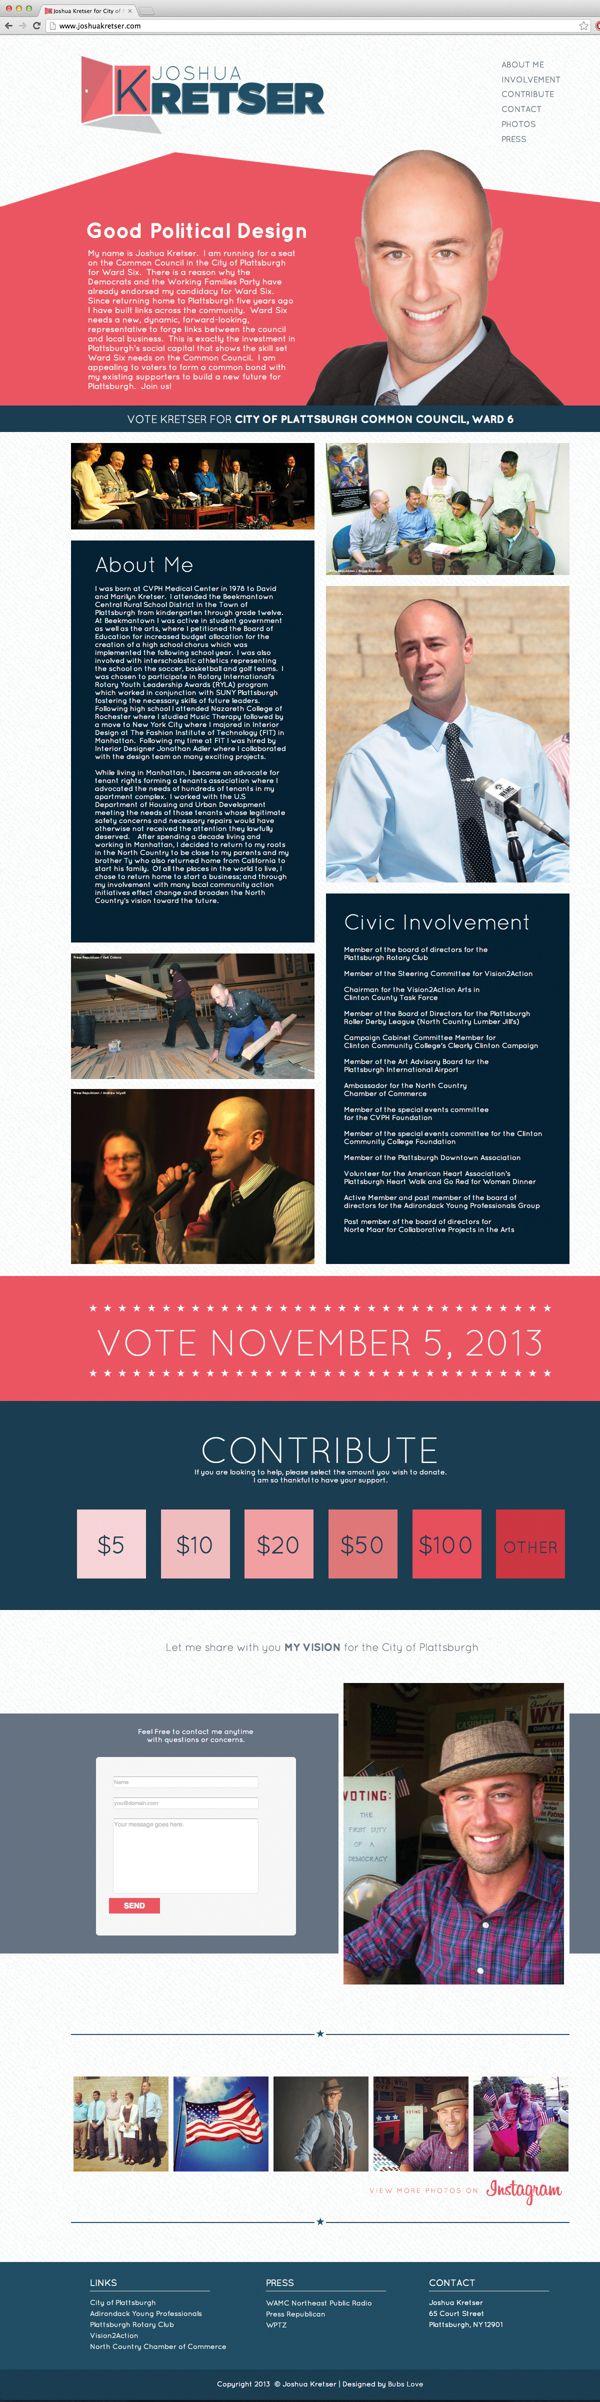 Joshua Kretser Political Campaign   Logo & Web Design by Mikey Lemieux, via Behance